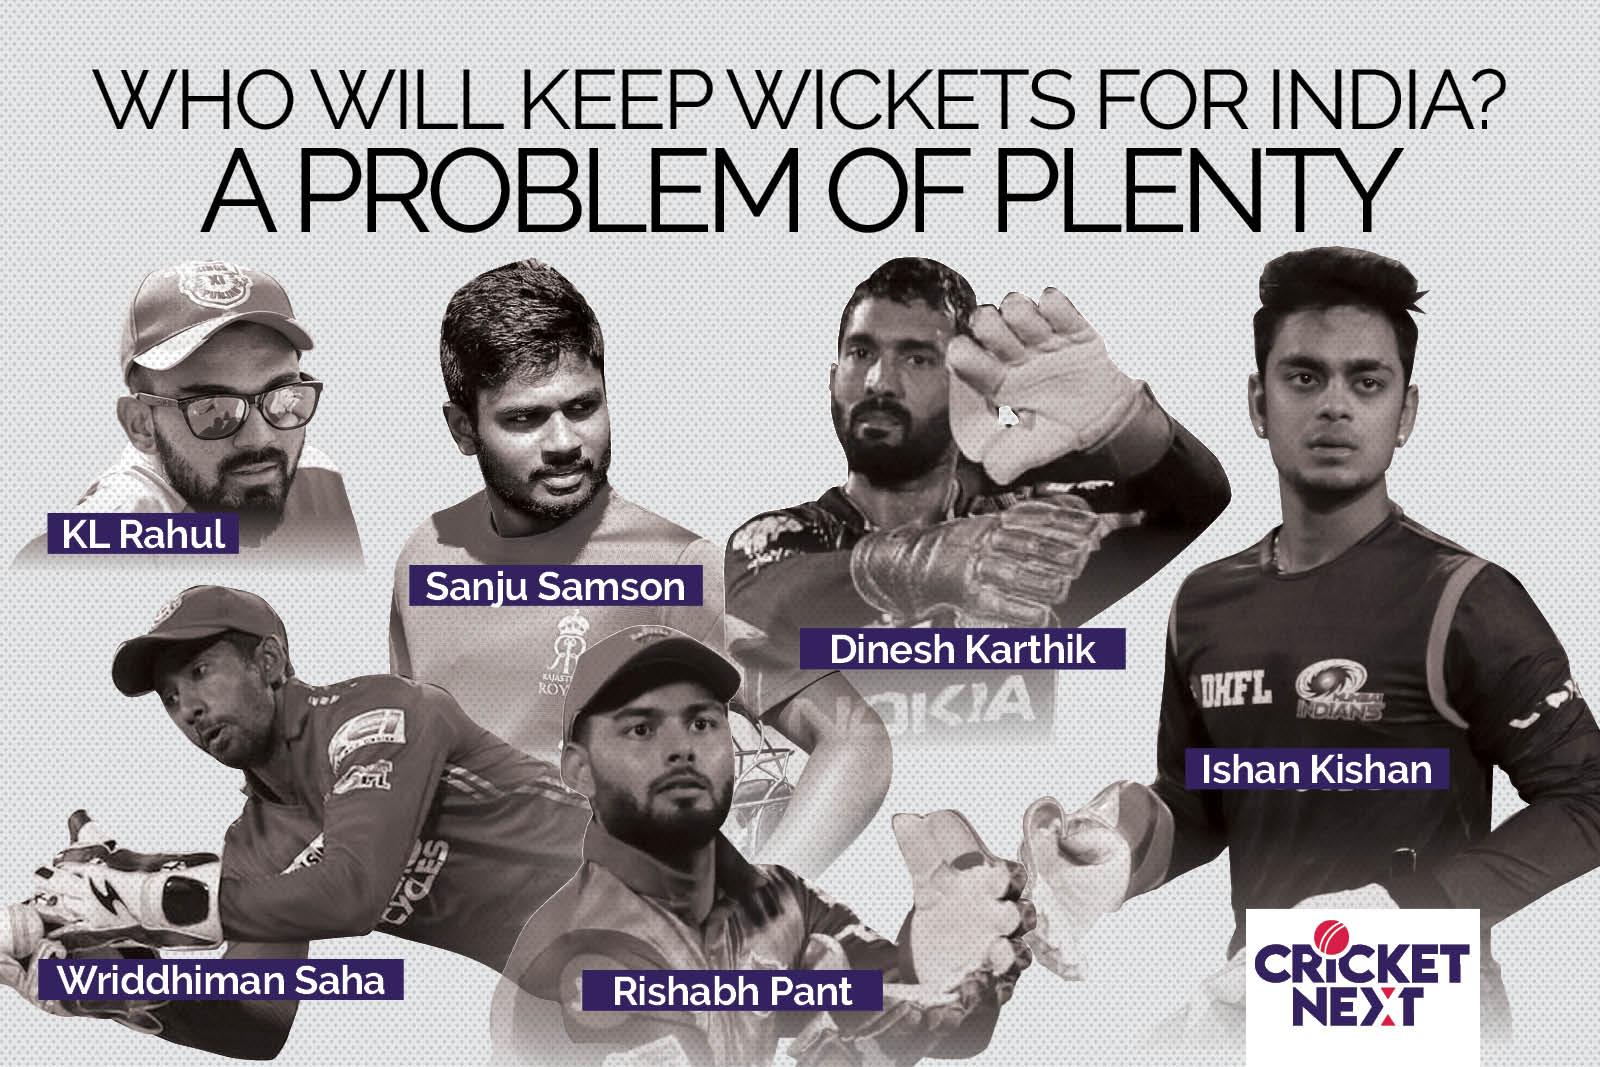 Who After MS Dhoni? KL Rahul First-Choice WicketKeeper, Ishan Kishan, Sanju Samson Give Tough Competition to Rishabh Pant